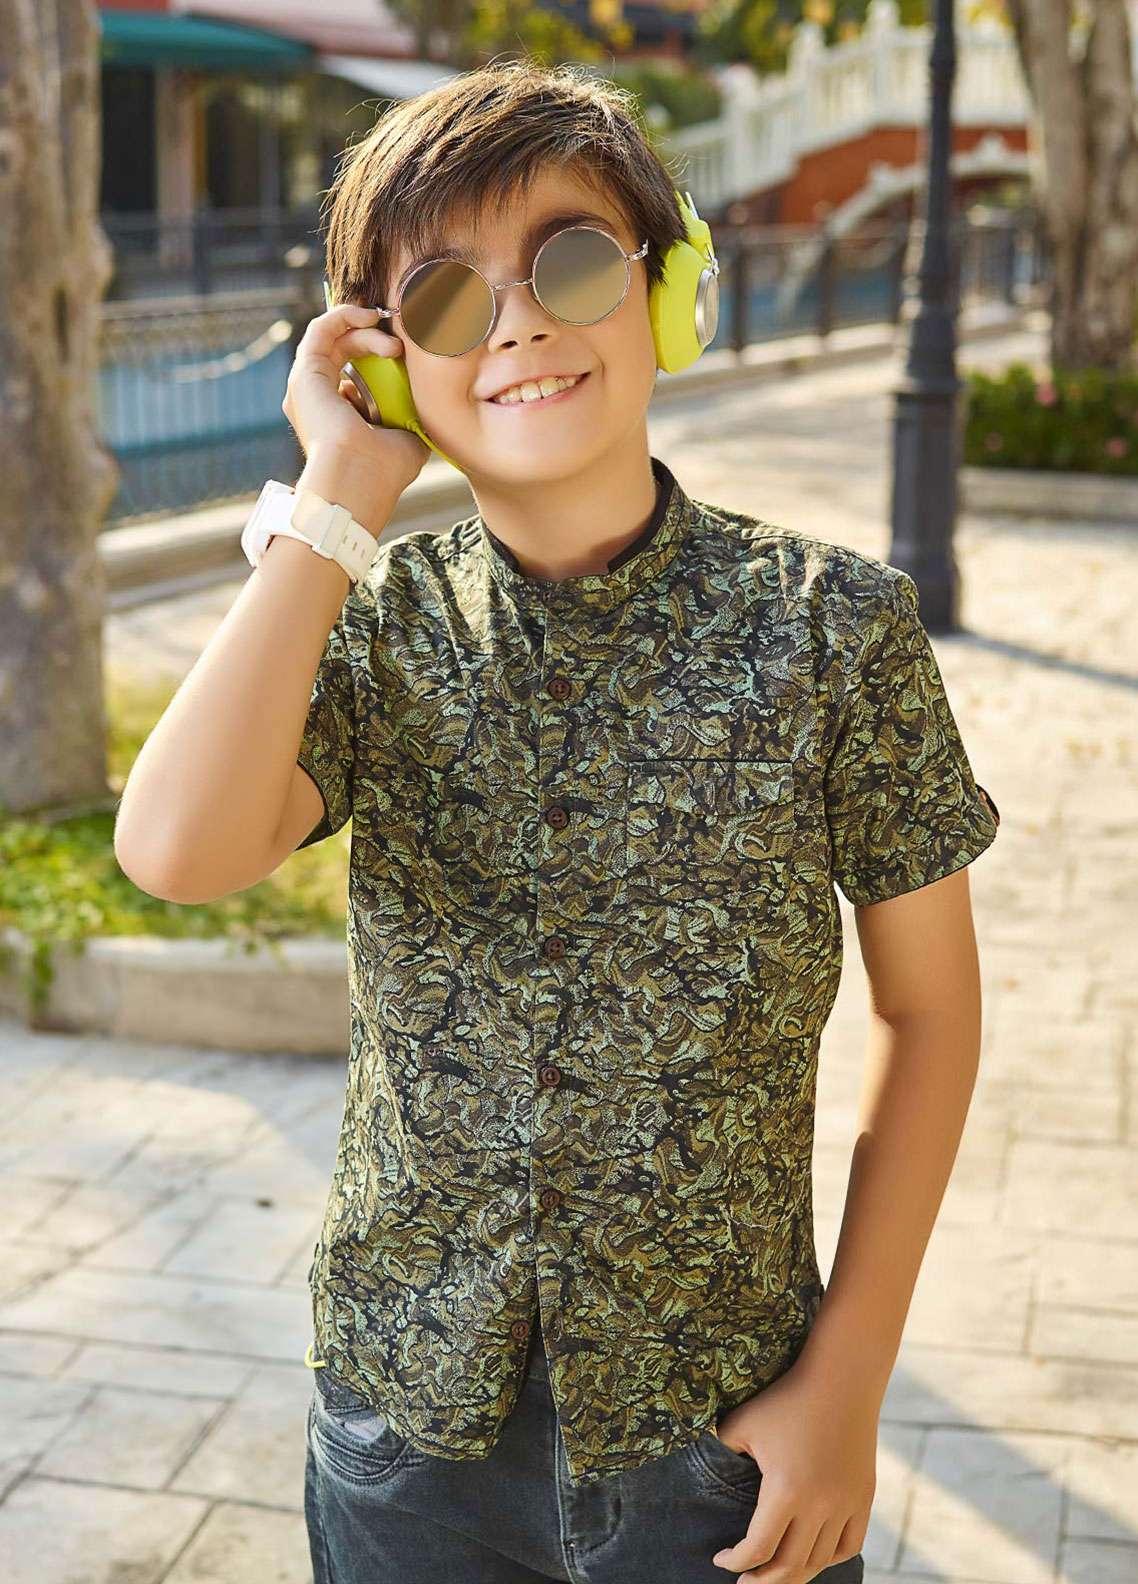 Edenrobe Cotton Casual Boys Shirts - Olive EBTS19-27215